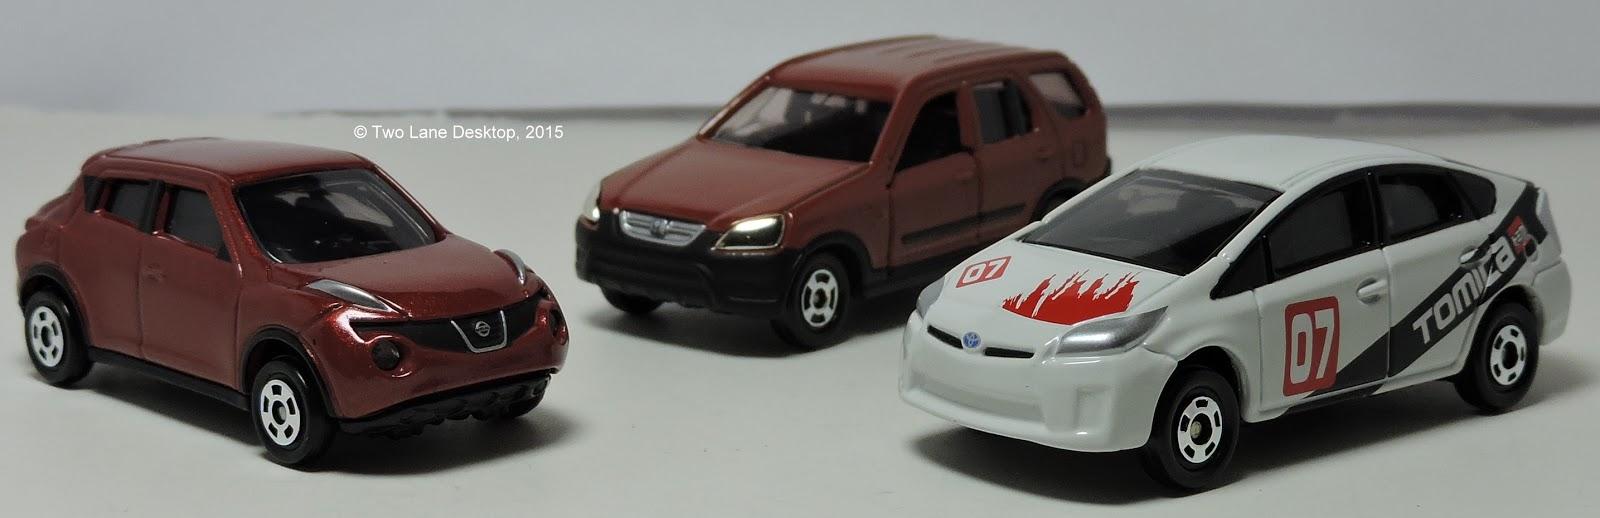 Tomica Time!: 2009 Toyota Prius, Nissan Juke, and 2004 Honda